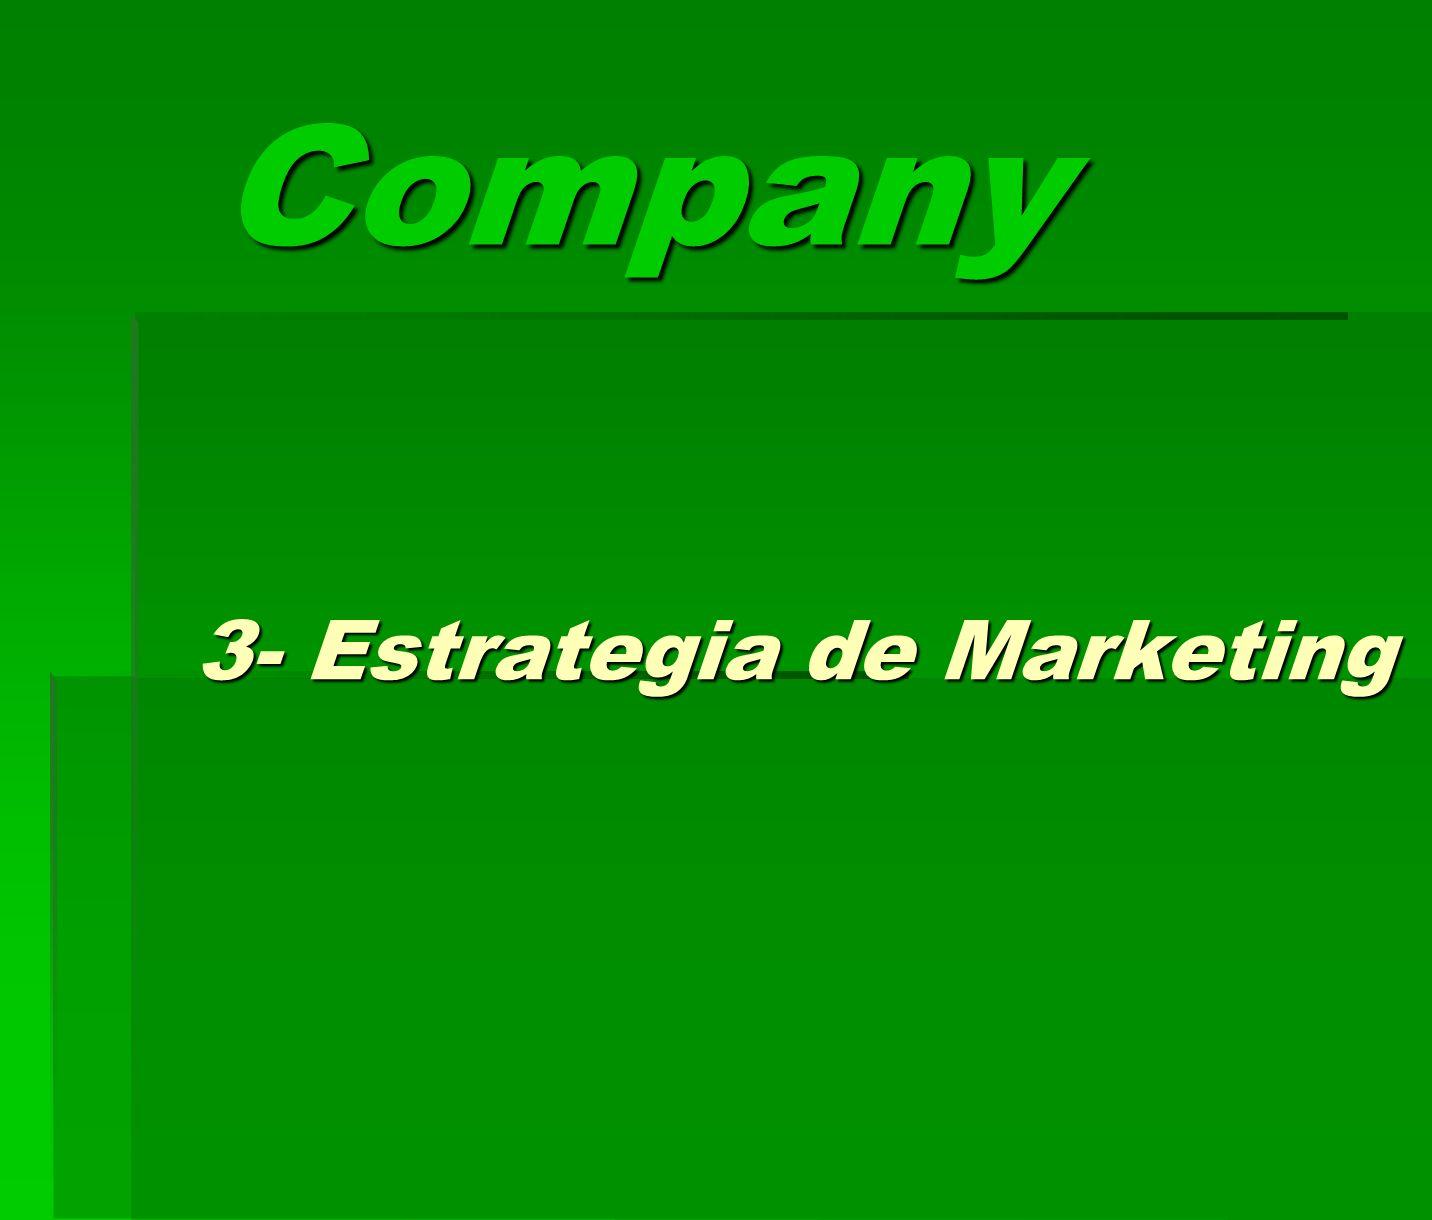 3- Estrategia de Marketing